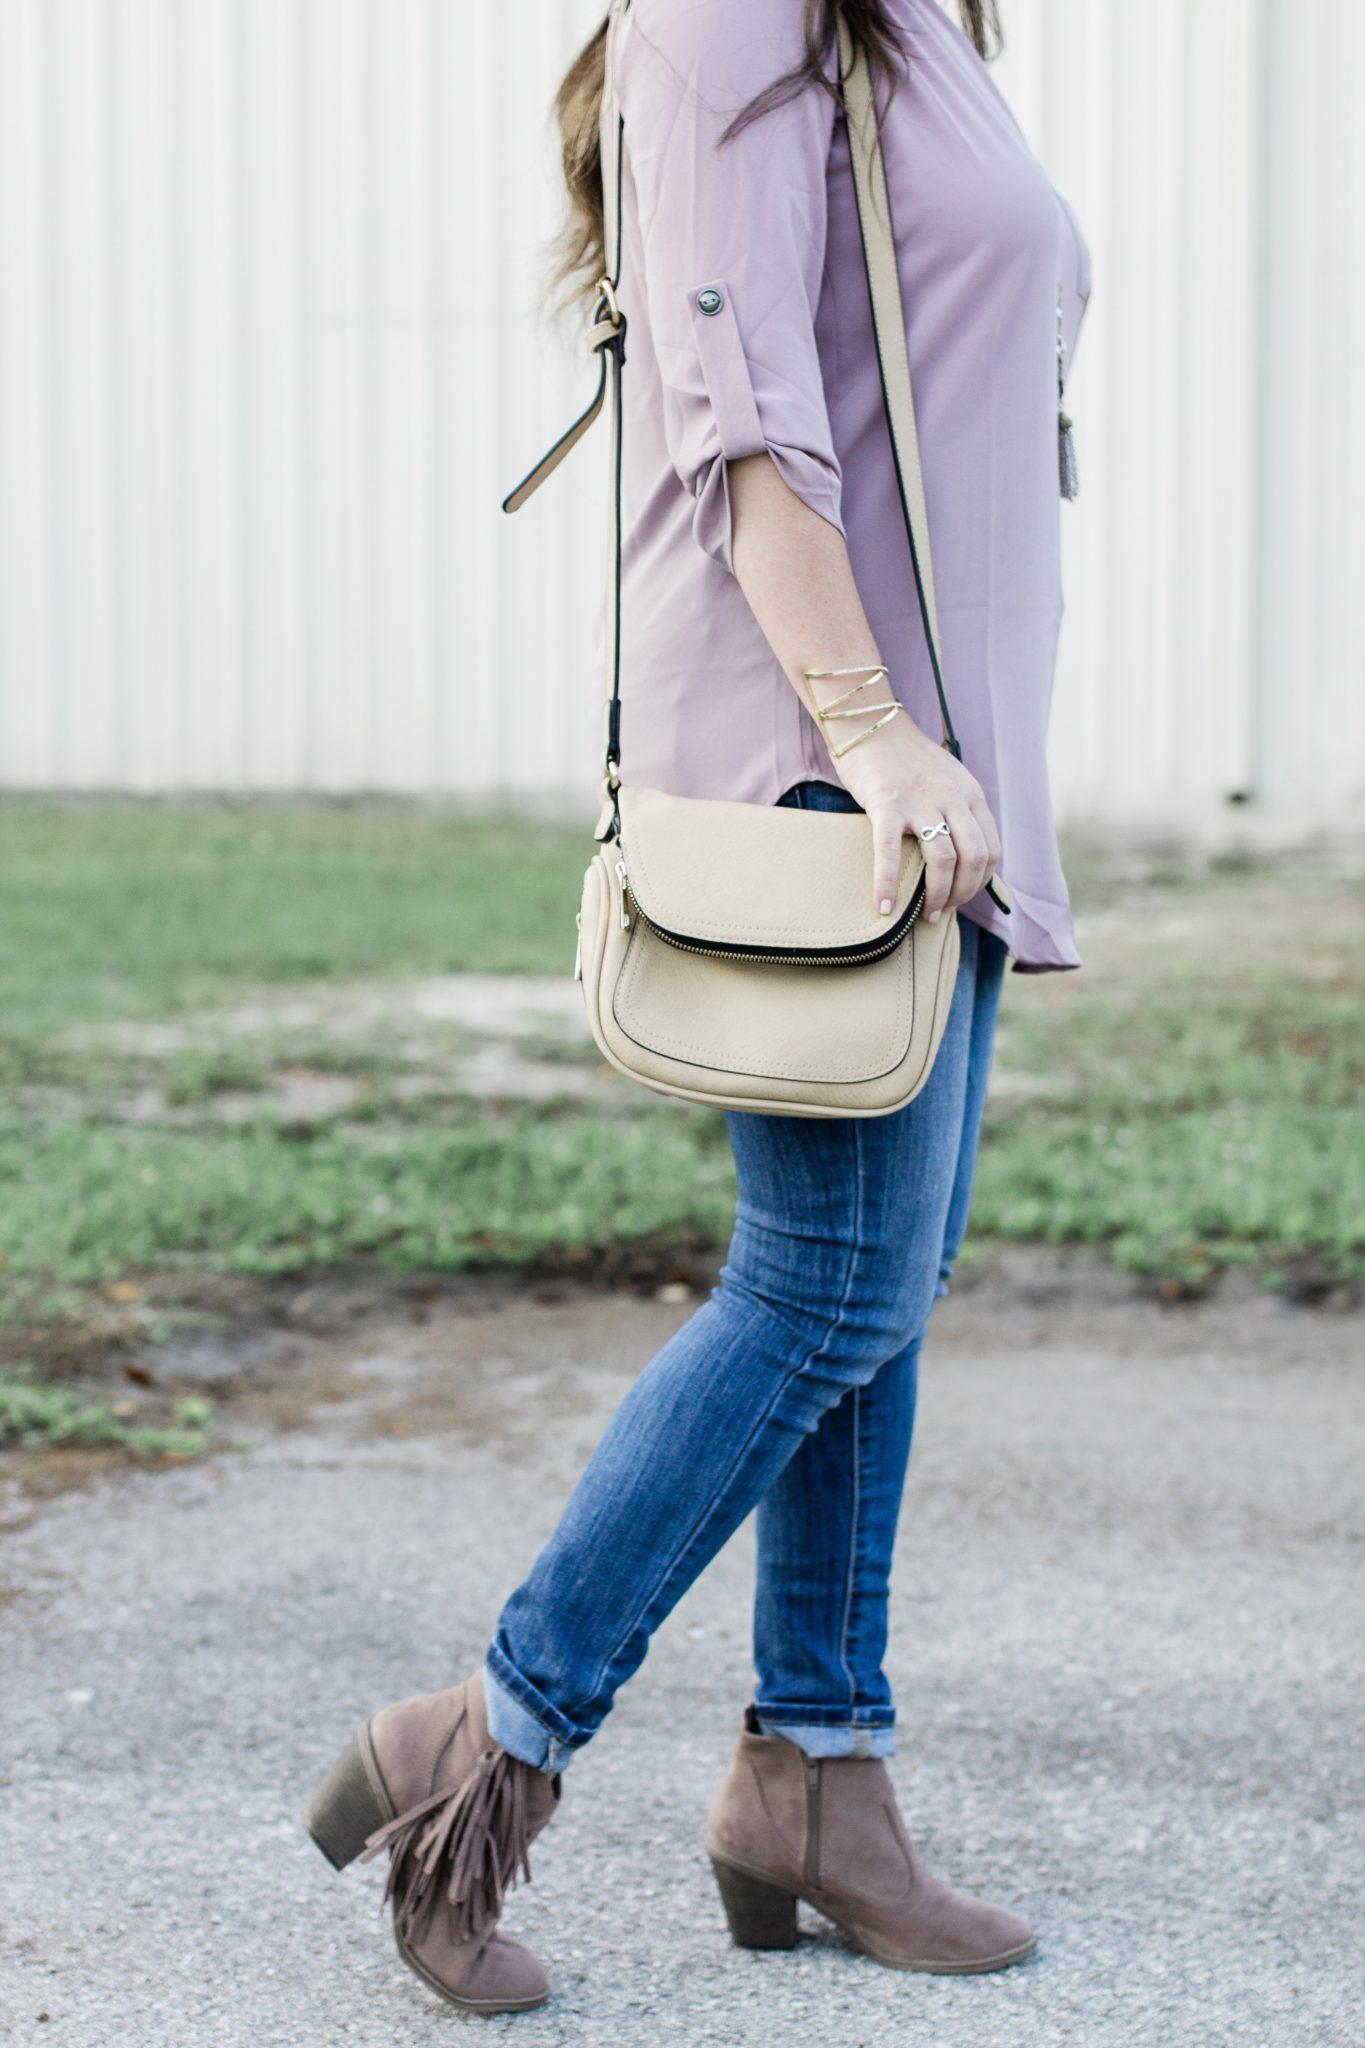 the purse club, designer purse on a budget, how to afford luxury designer handbags on a budget